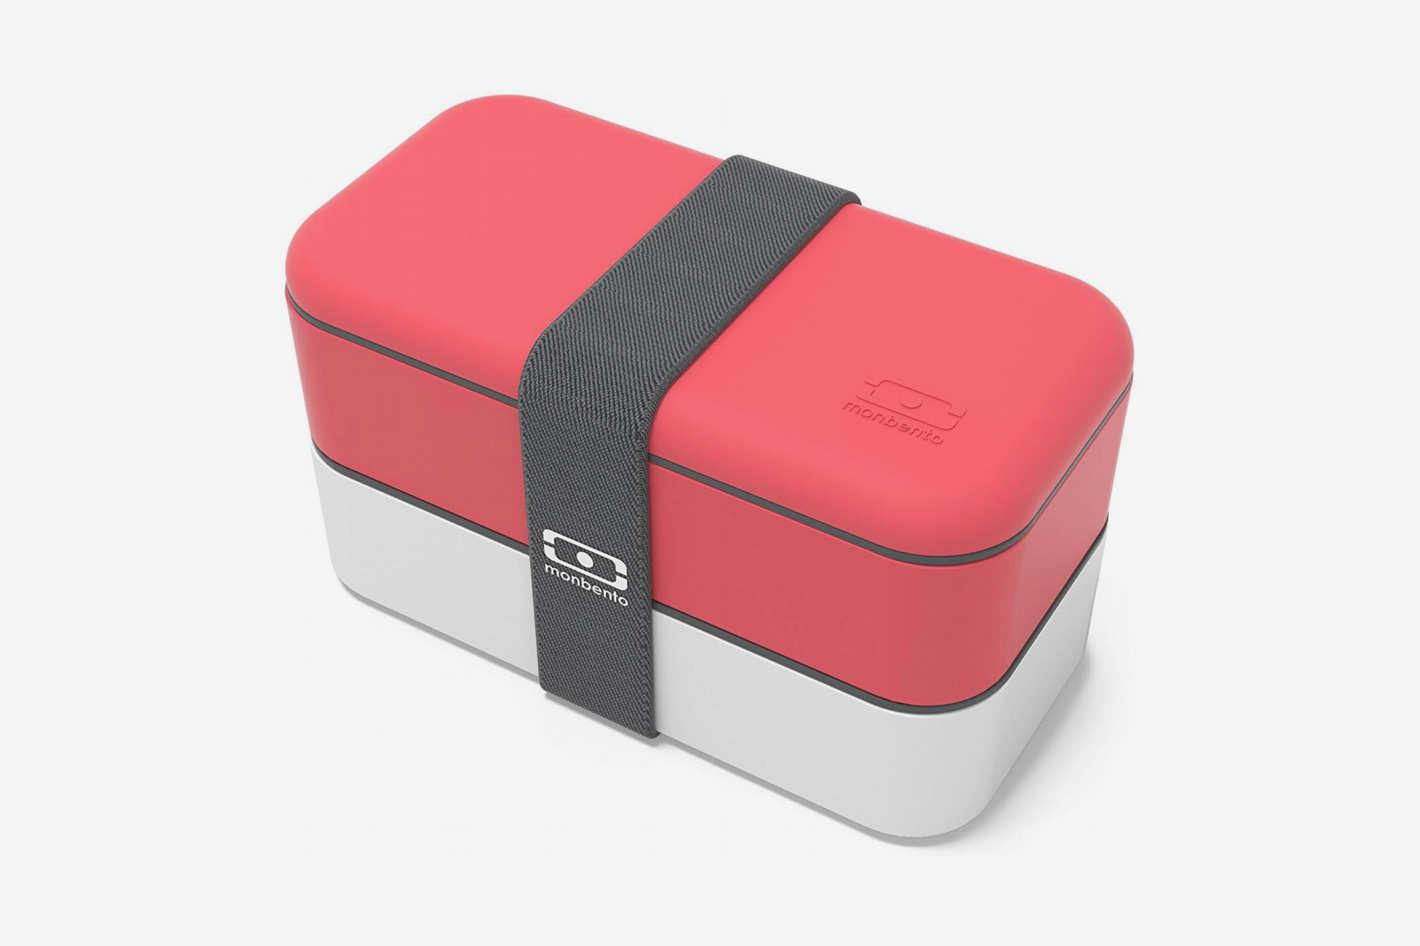 Monbento MB Original Bento Lunch Box